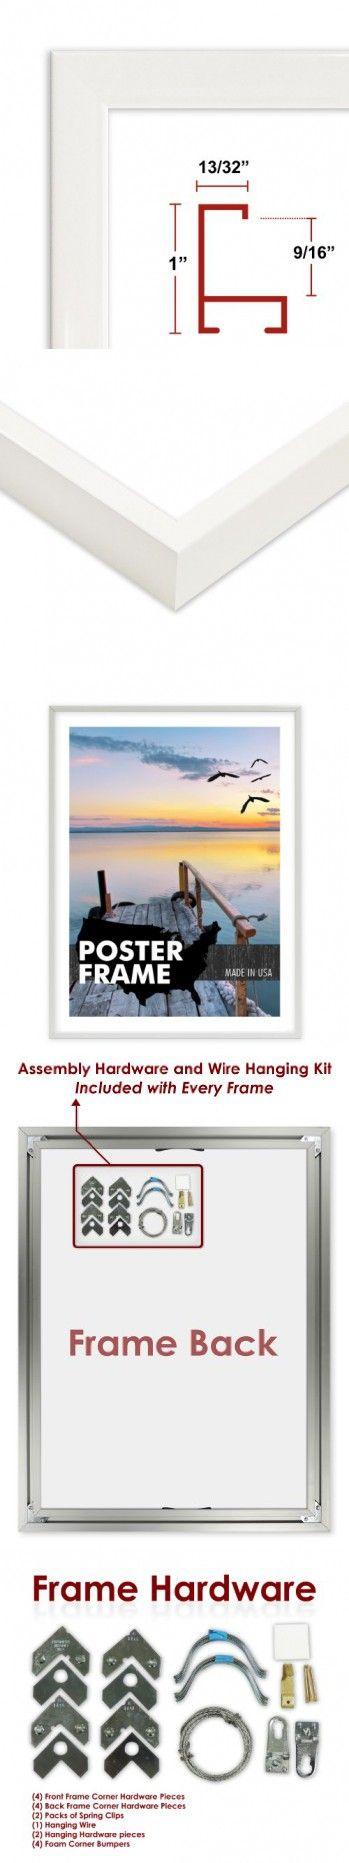 25 X 38 Poster Frame Profile 93 White Custom Size Picture Frame Poster Frame Picture Frames Frame